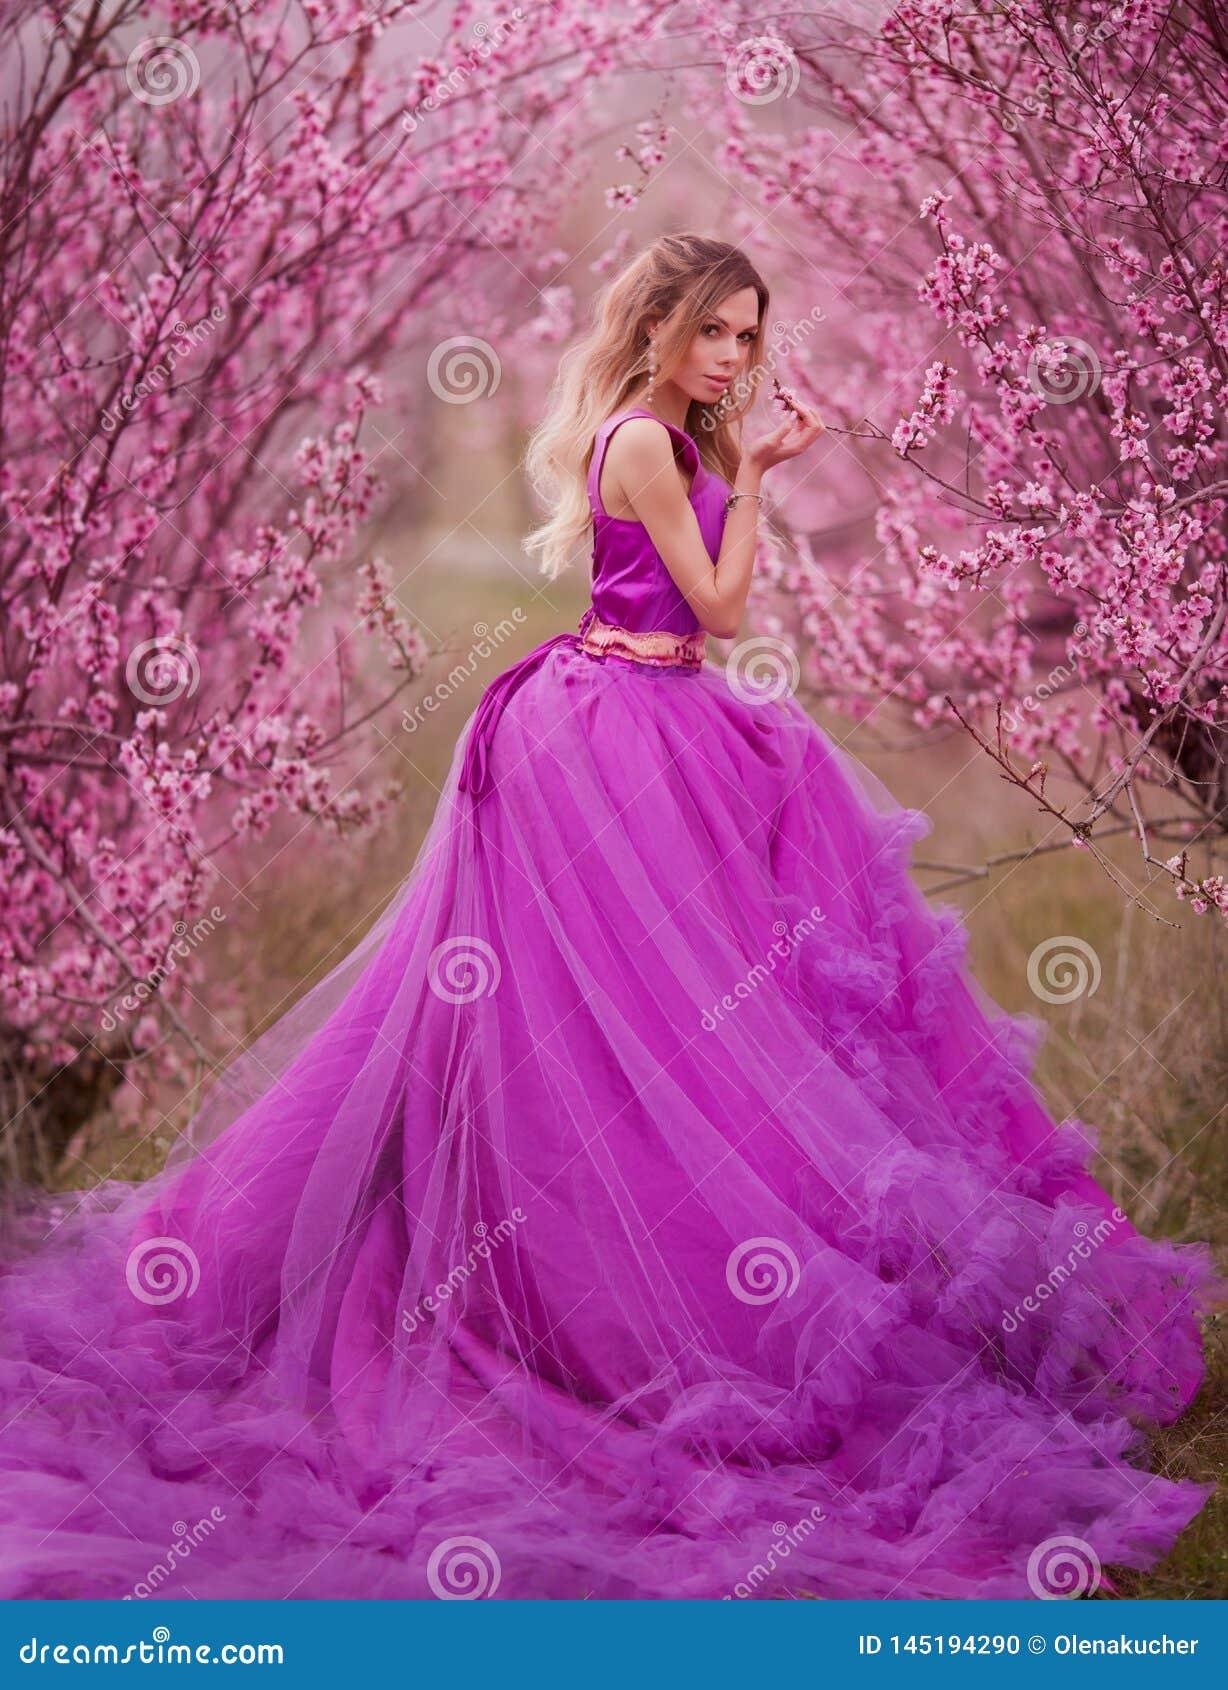 Girl in pink dress in blooming gardens